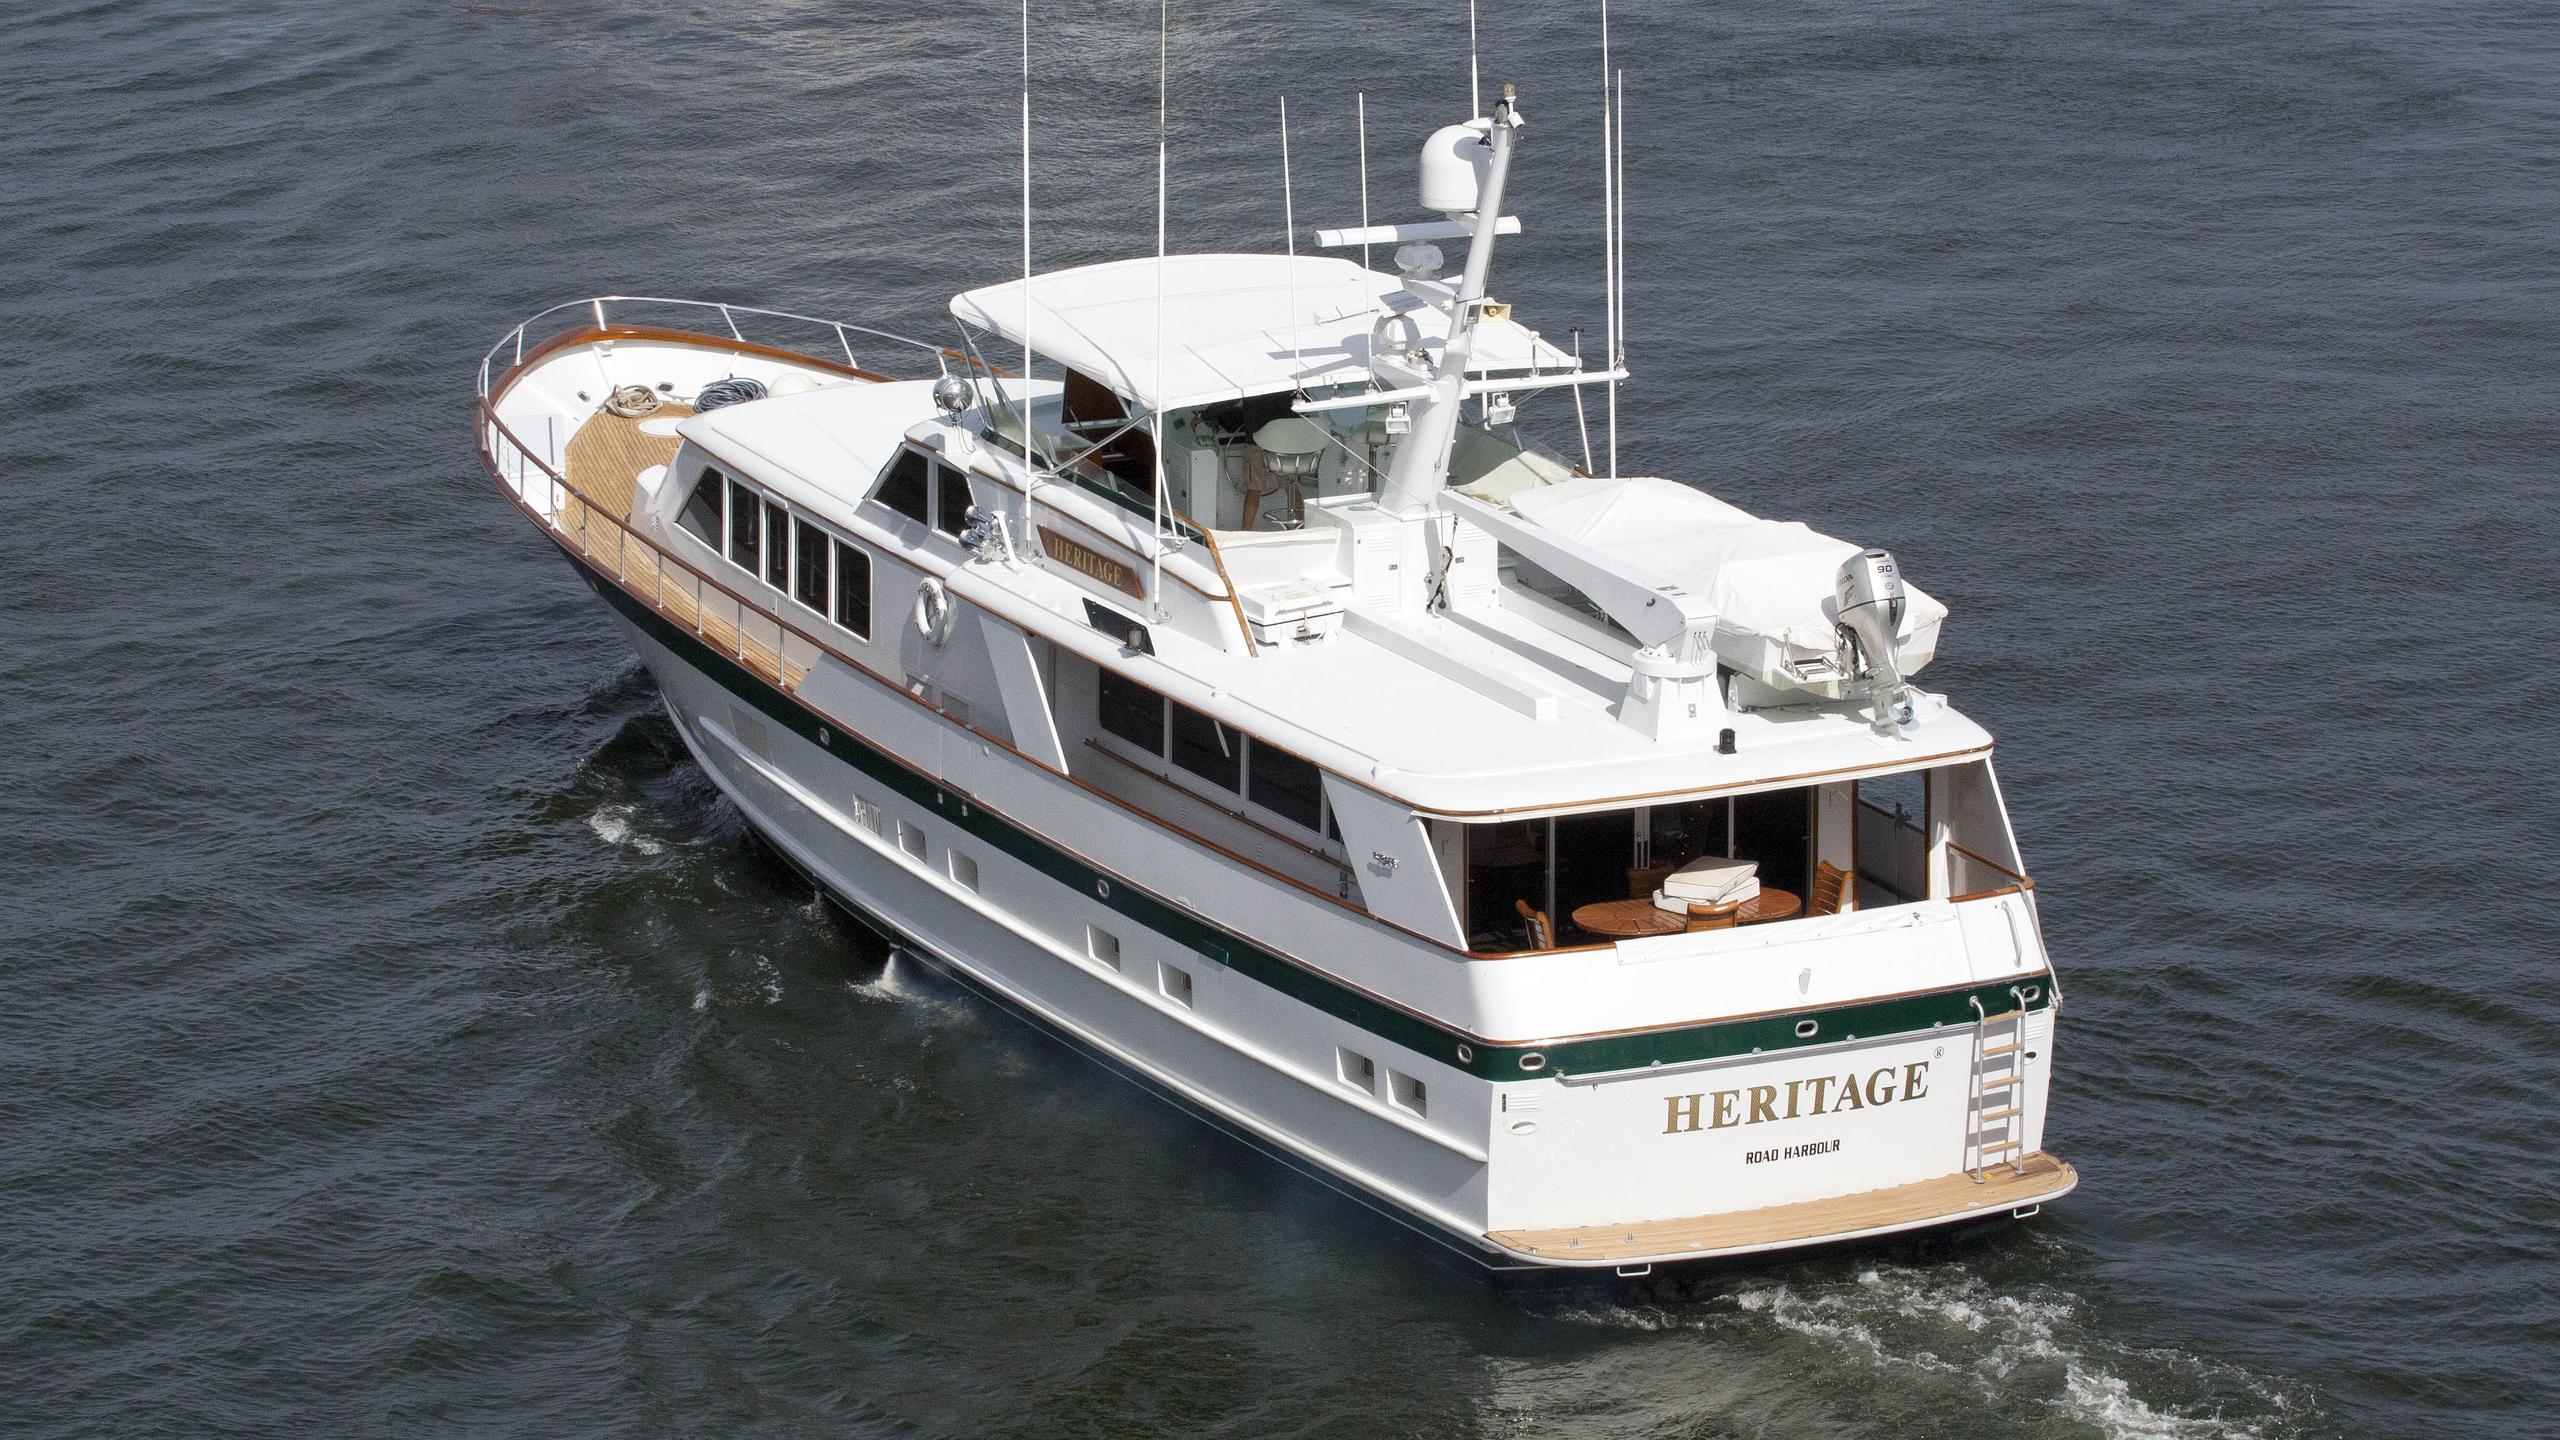 heritage motoryacht burger boat 1987 27m stern